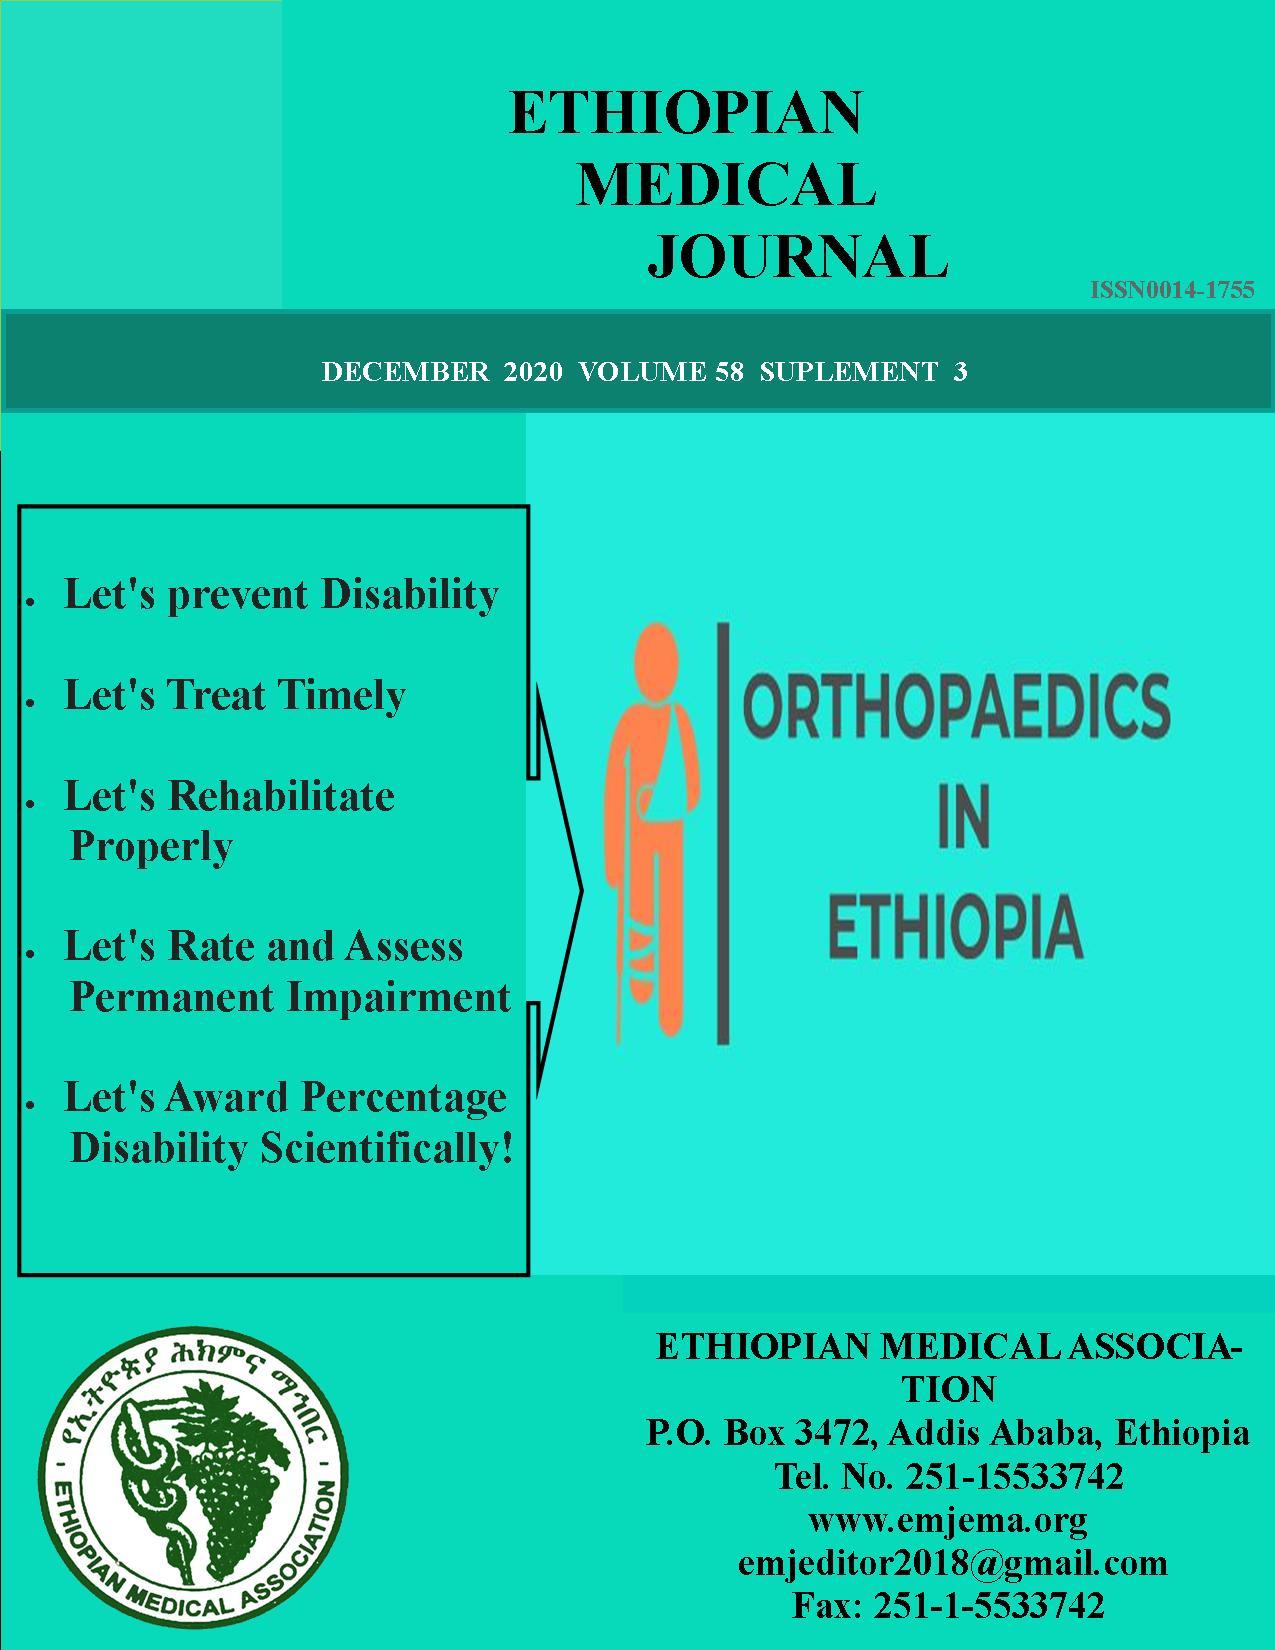 View Vol. 58 No. Supplement 03 (2020): ORTHOPEDICS IN ETHIOPIA